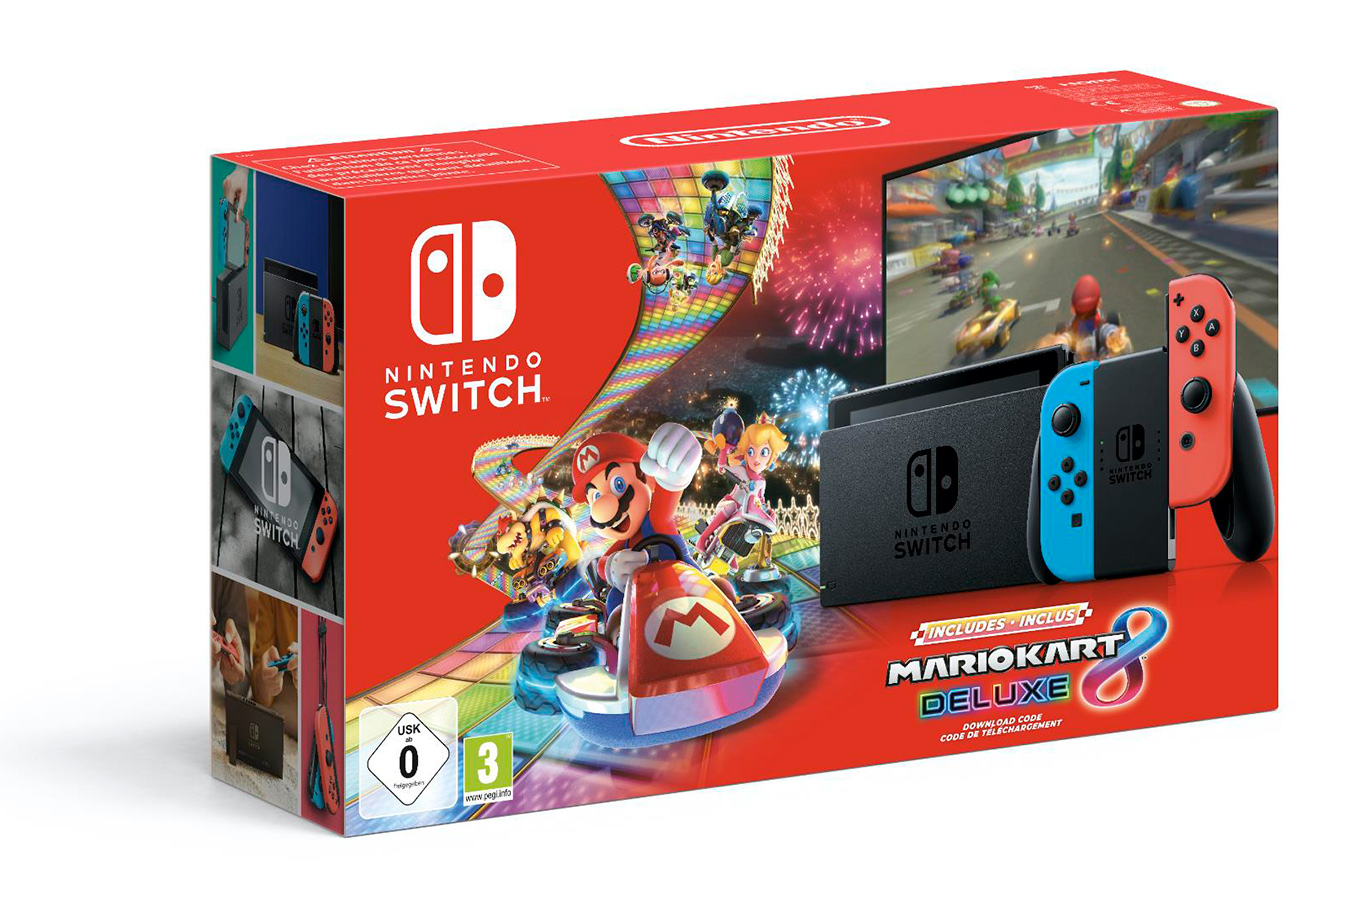 Nintendo Switch Bundle и Mario Kart 8 Deluxe [NSCNMK8]